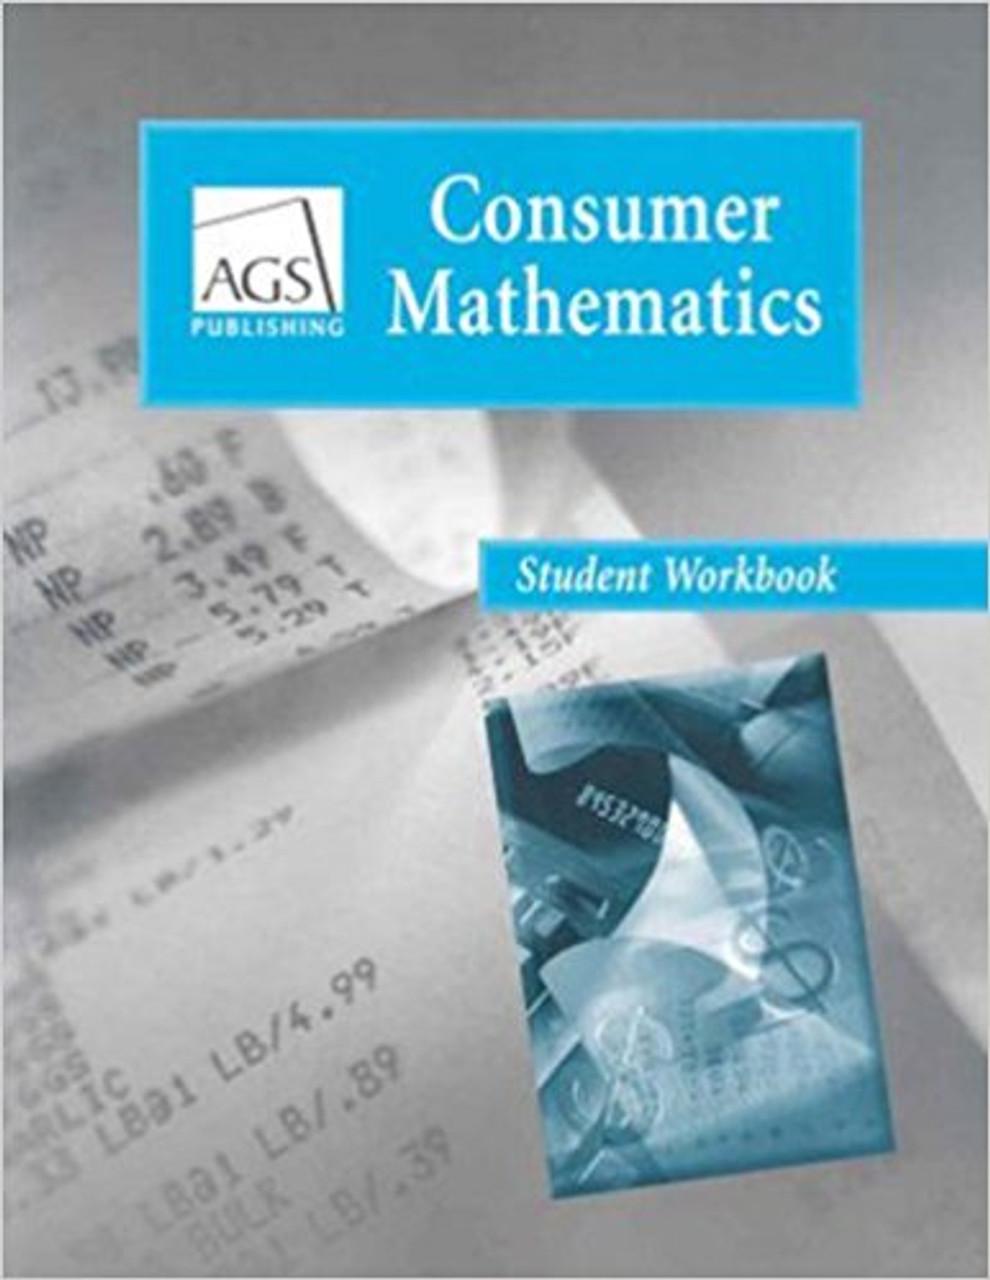 AGS Consumer Math Student Workbook Answer Key - Classroom Resource Center [ 1280 x 990 Pixel ]